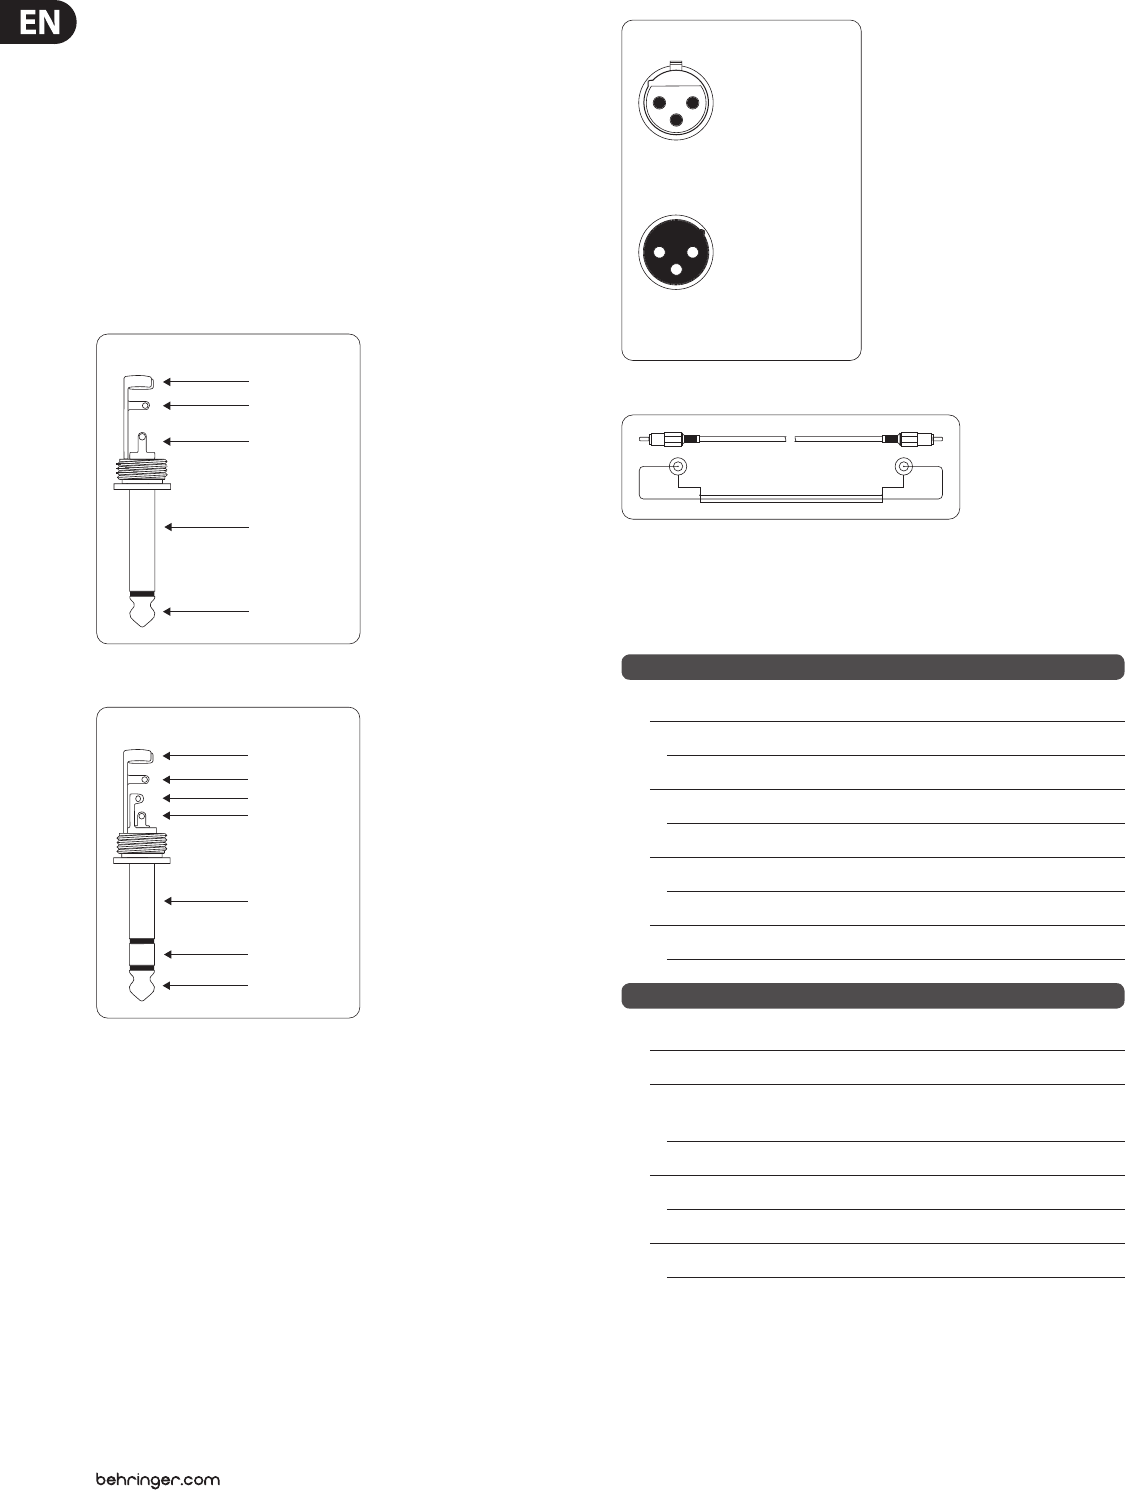 Behringer Ultratone K1800Fx Users Manual K3000FX/K1800FX